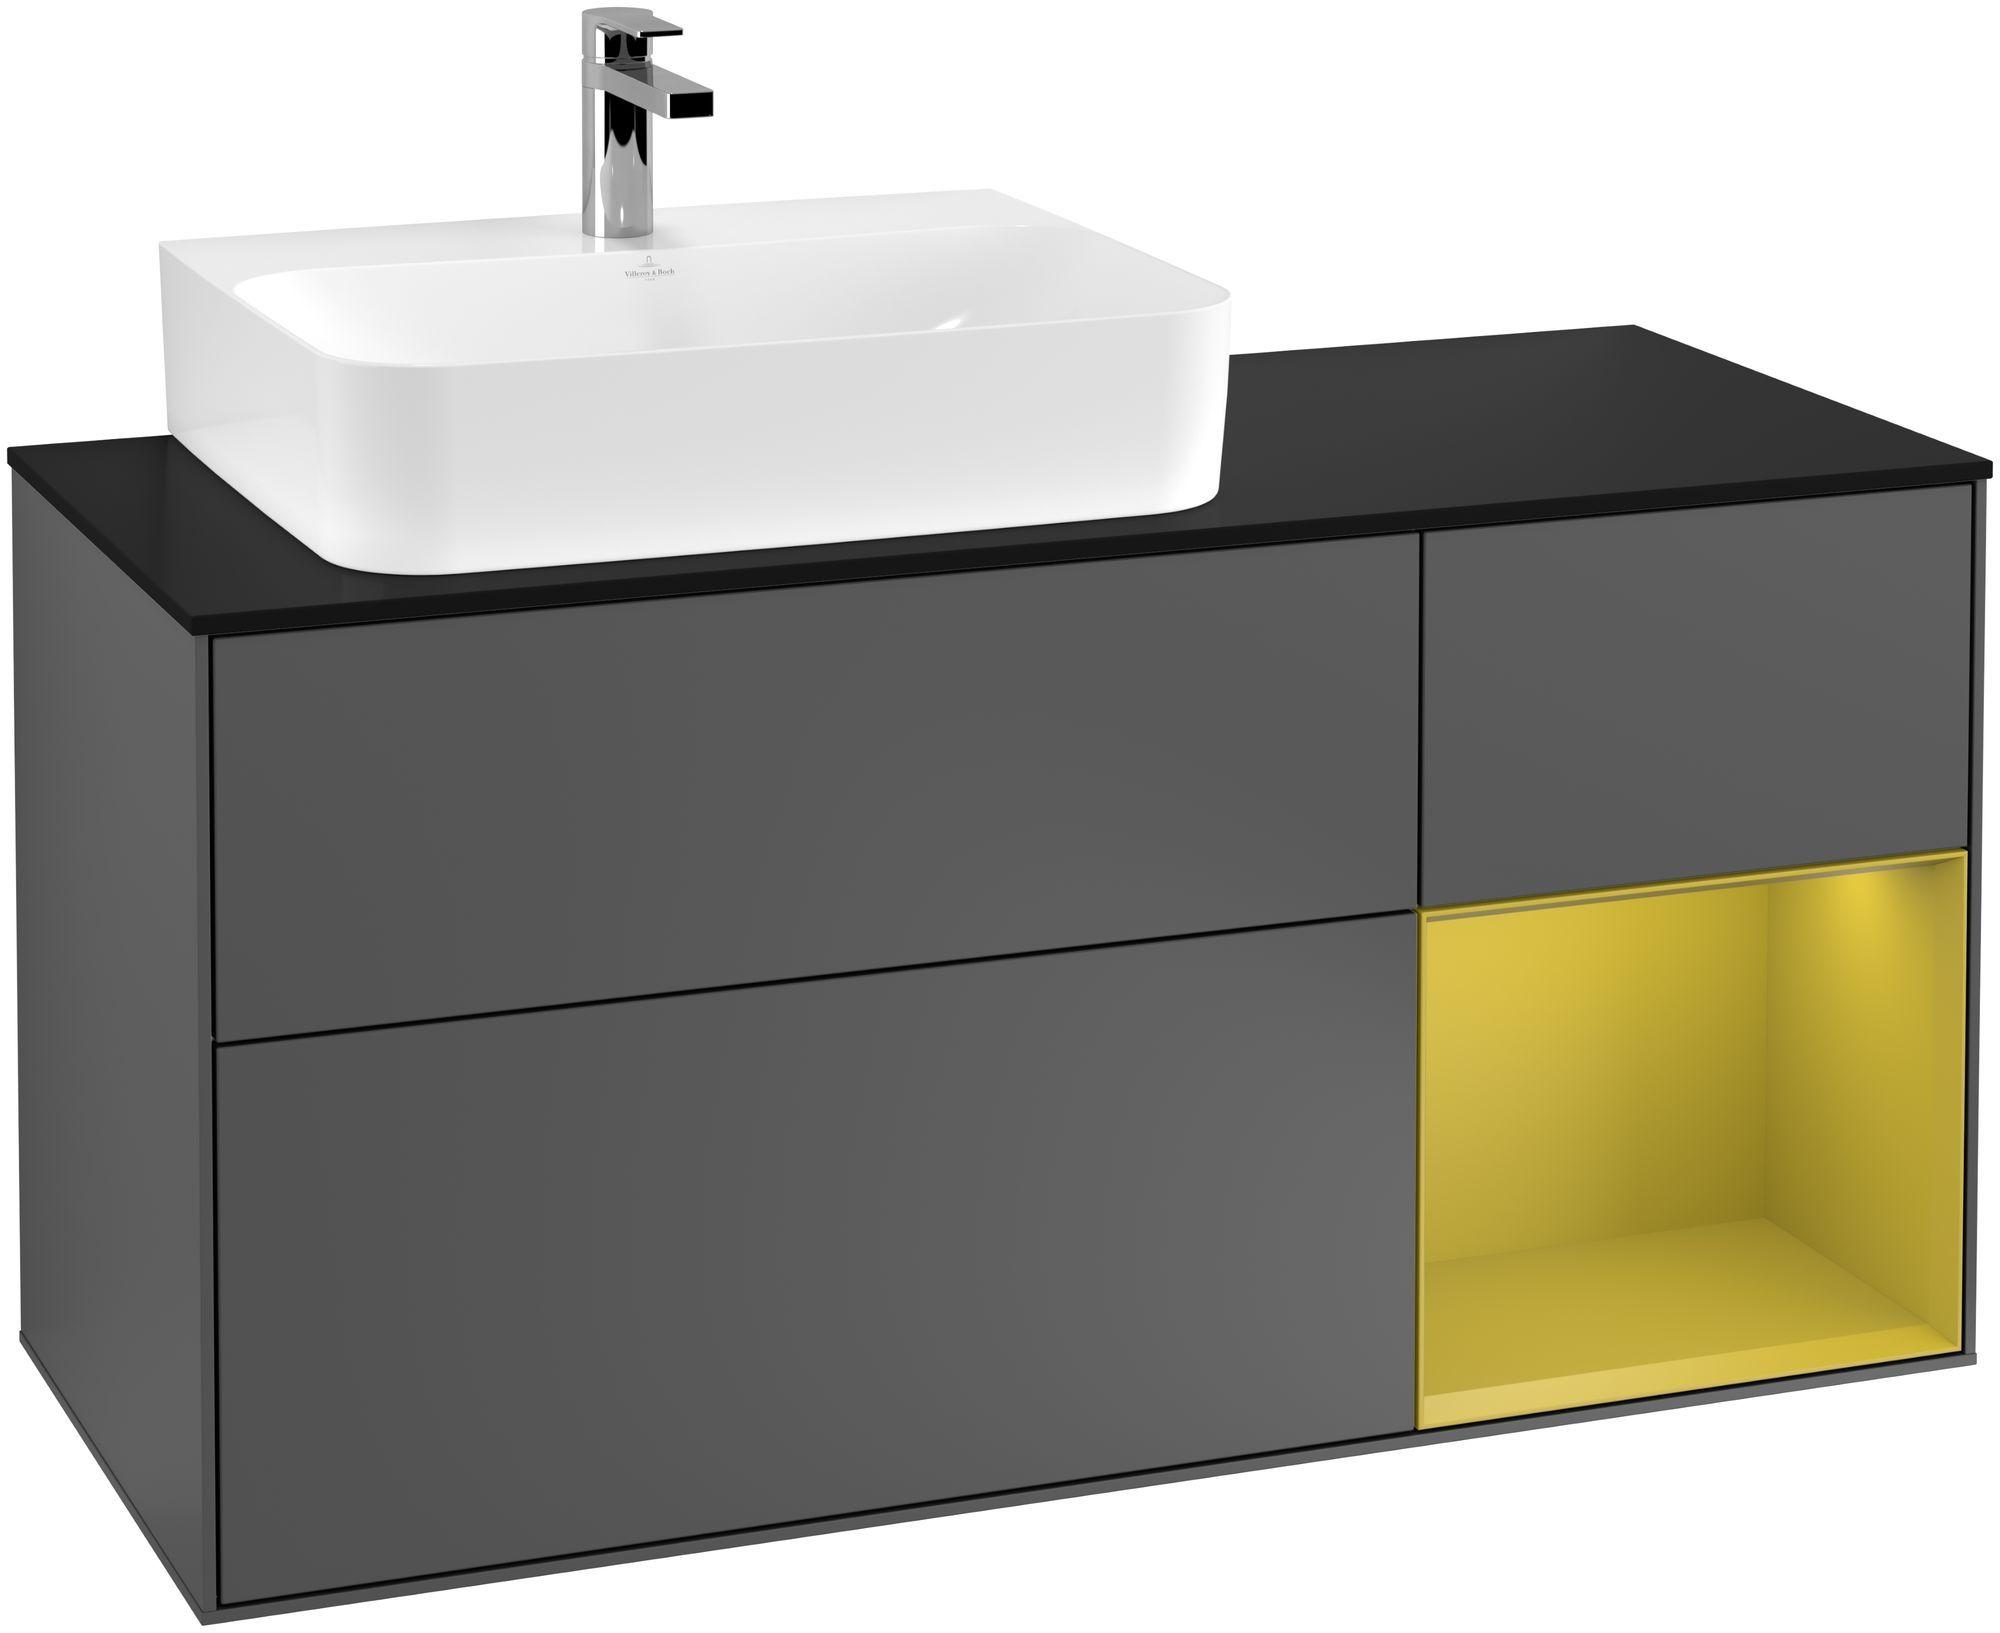 Villeroy & Boch Finion G15 Waschtischunterschrank mit Regalelement 3 Auszüge Waschtisch links LED-Beleuchtung B:120xH:60,3xT:50,1cm Front, Korpus: Anthracite Matt, Regal: Sun, Glasplatte: Black Matt G152HEGK